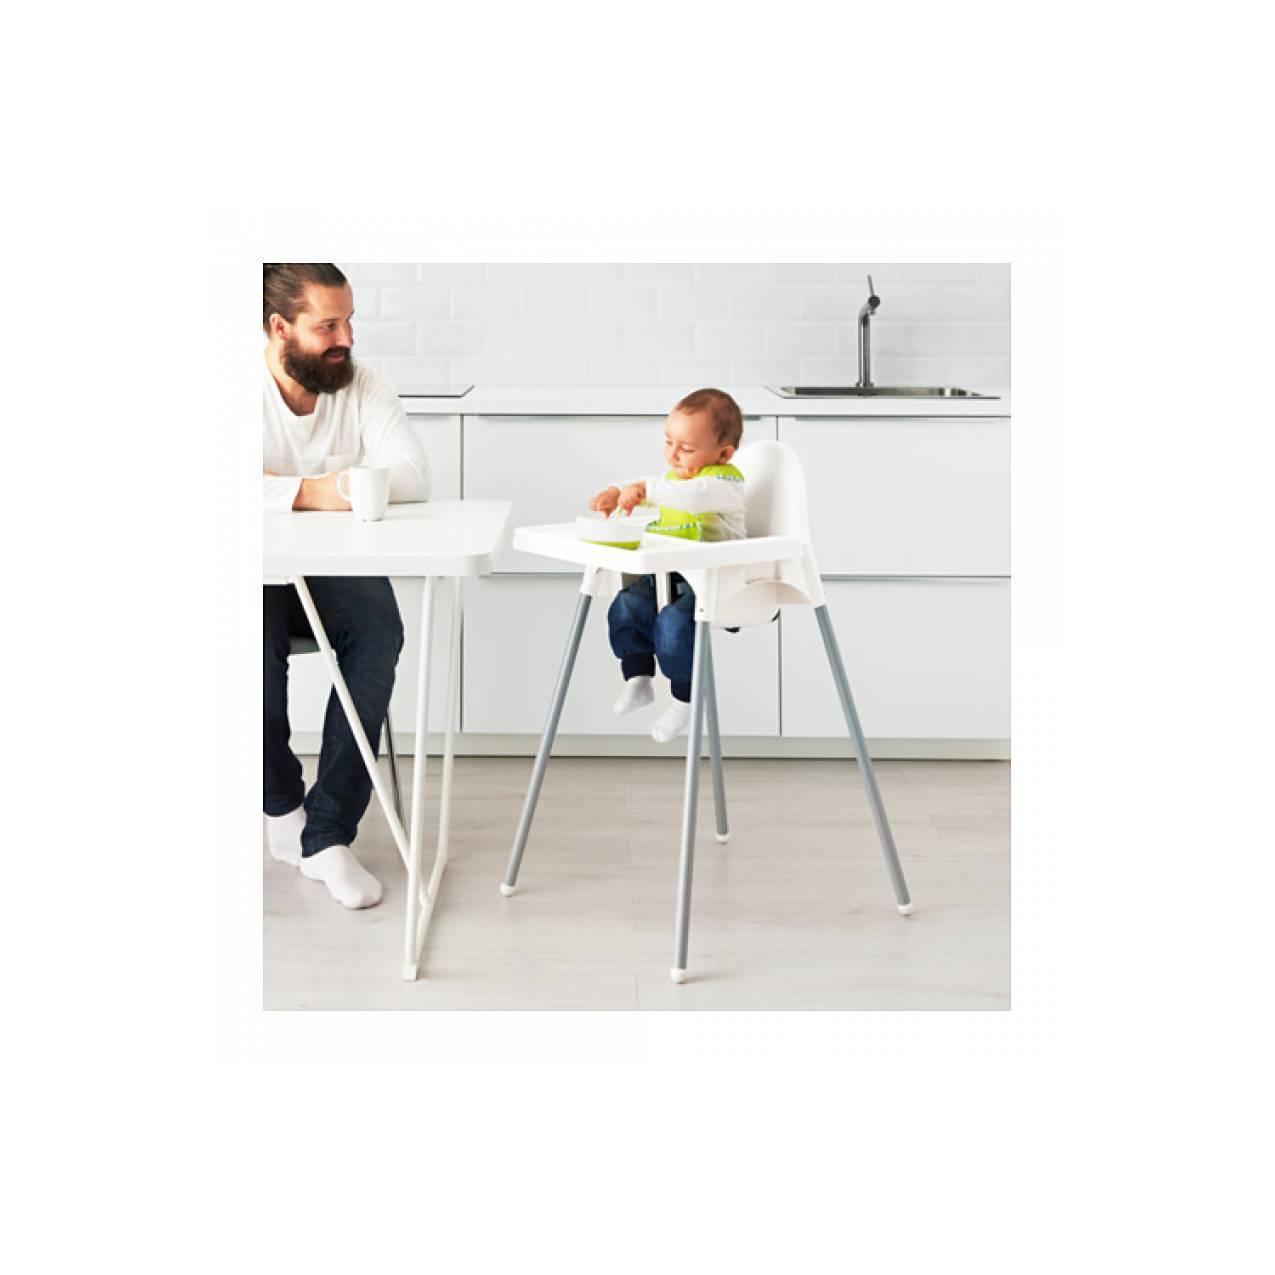 Ikea Antilop Bangku tinggi anak Kursi makan anak Meja Makan anak